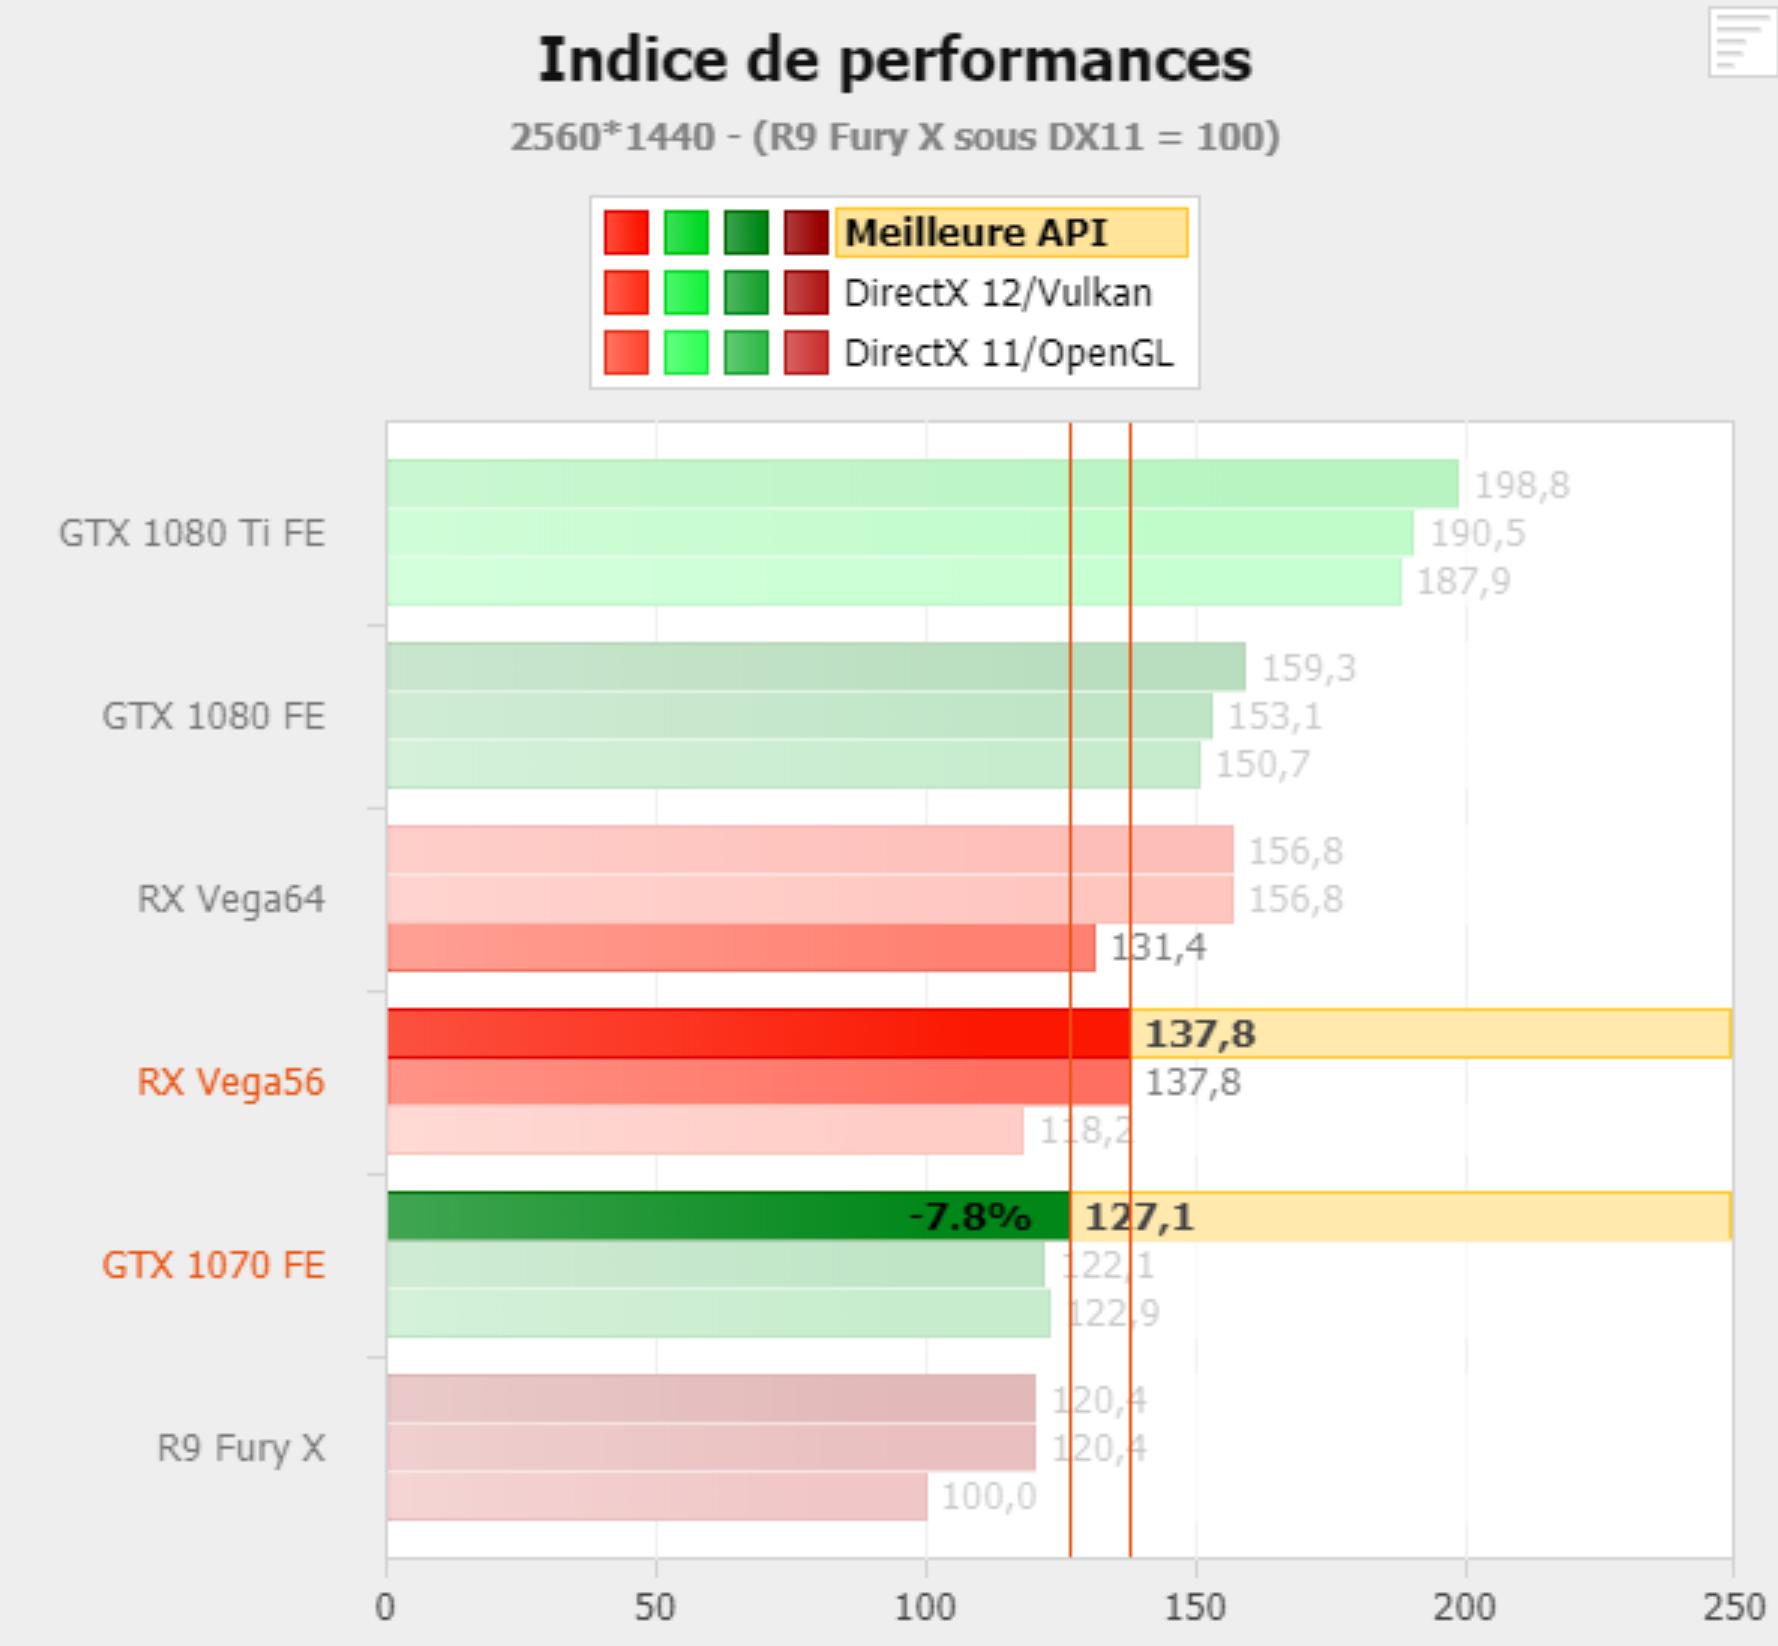 http://luminais.olivier.free.fr/image/indice-de-performance-VEGA-56.png